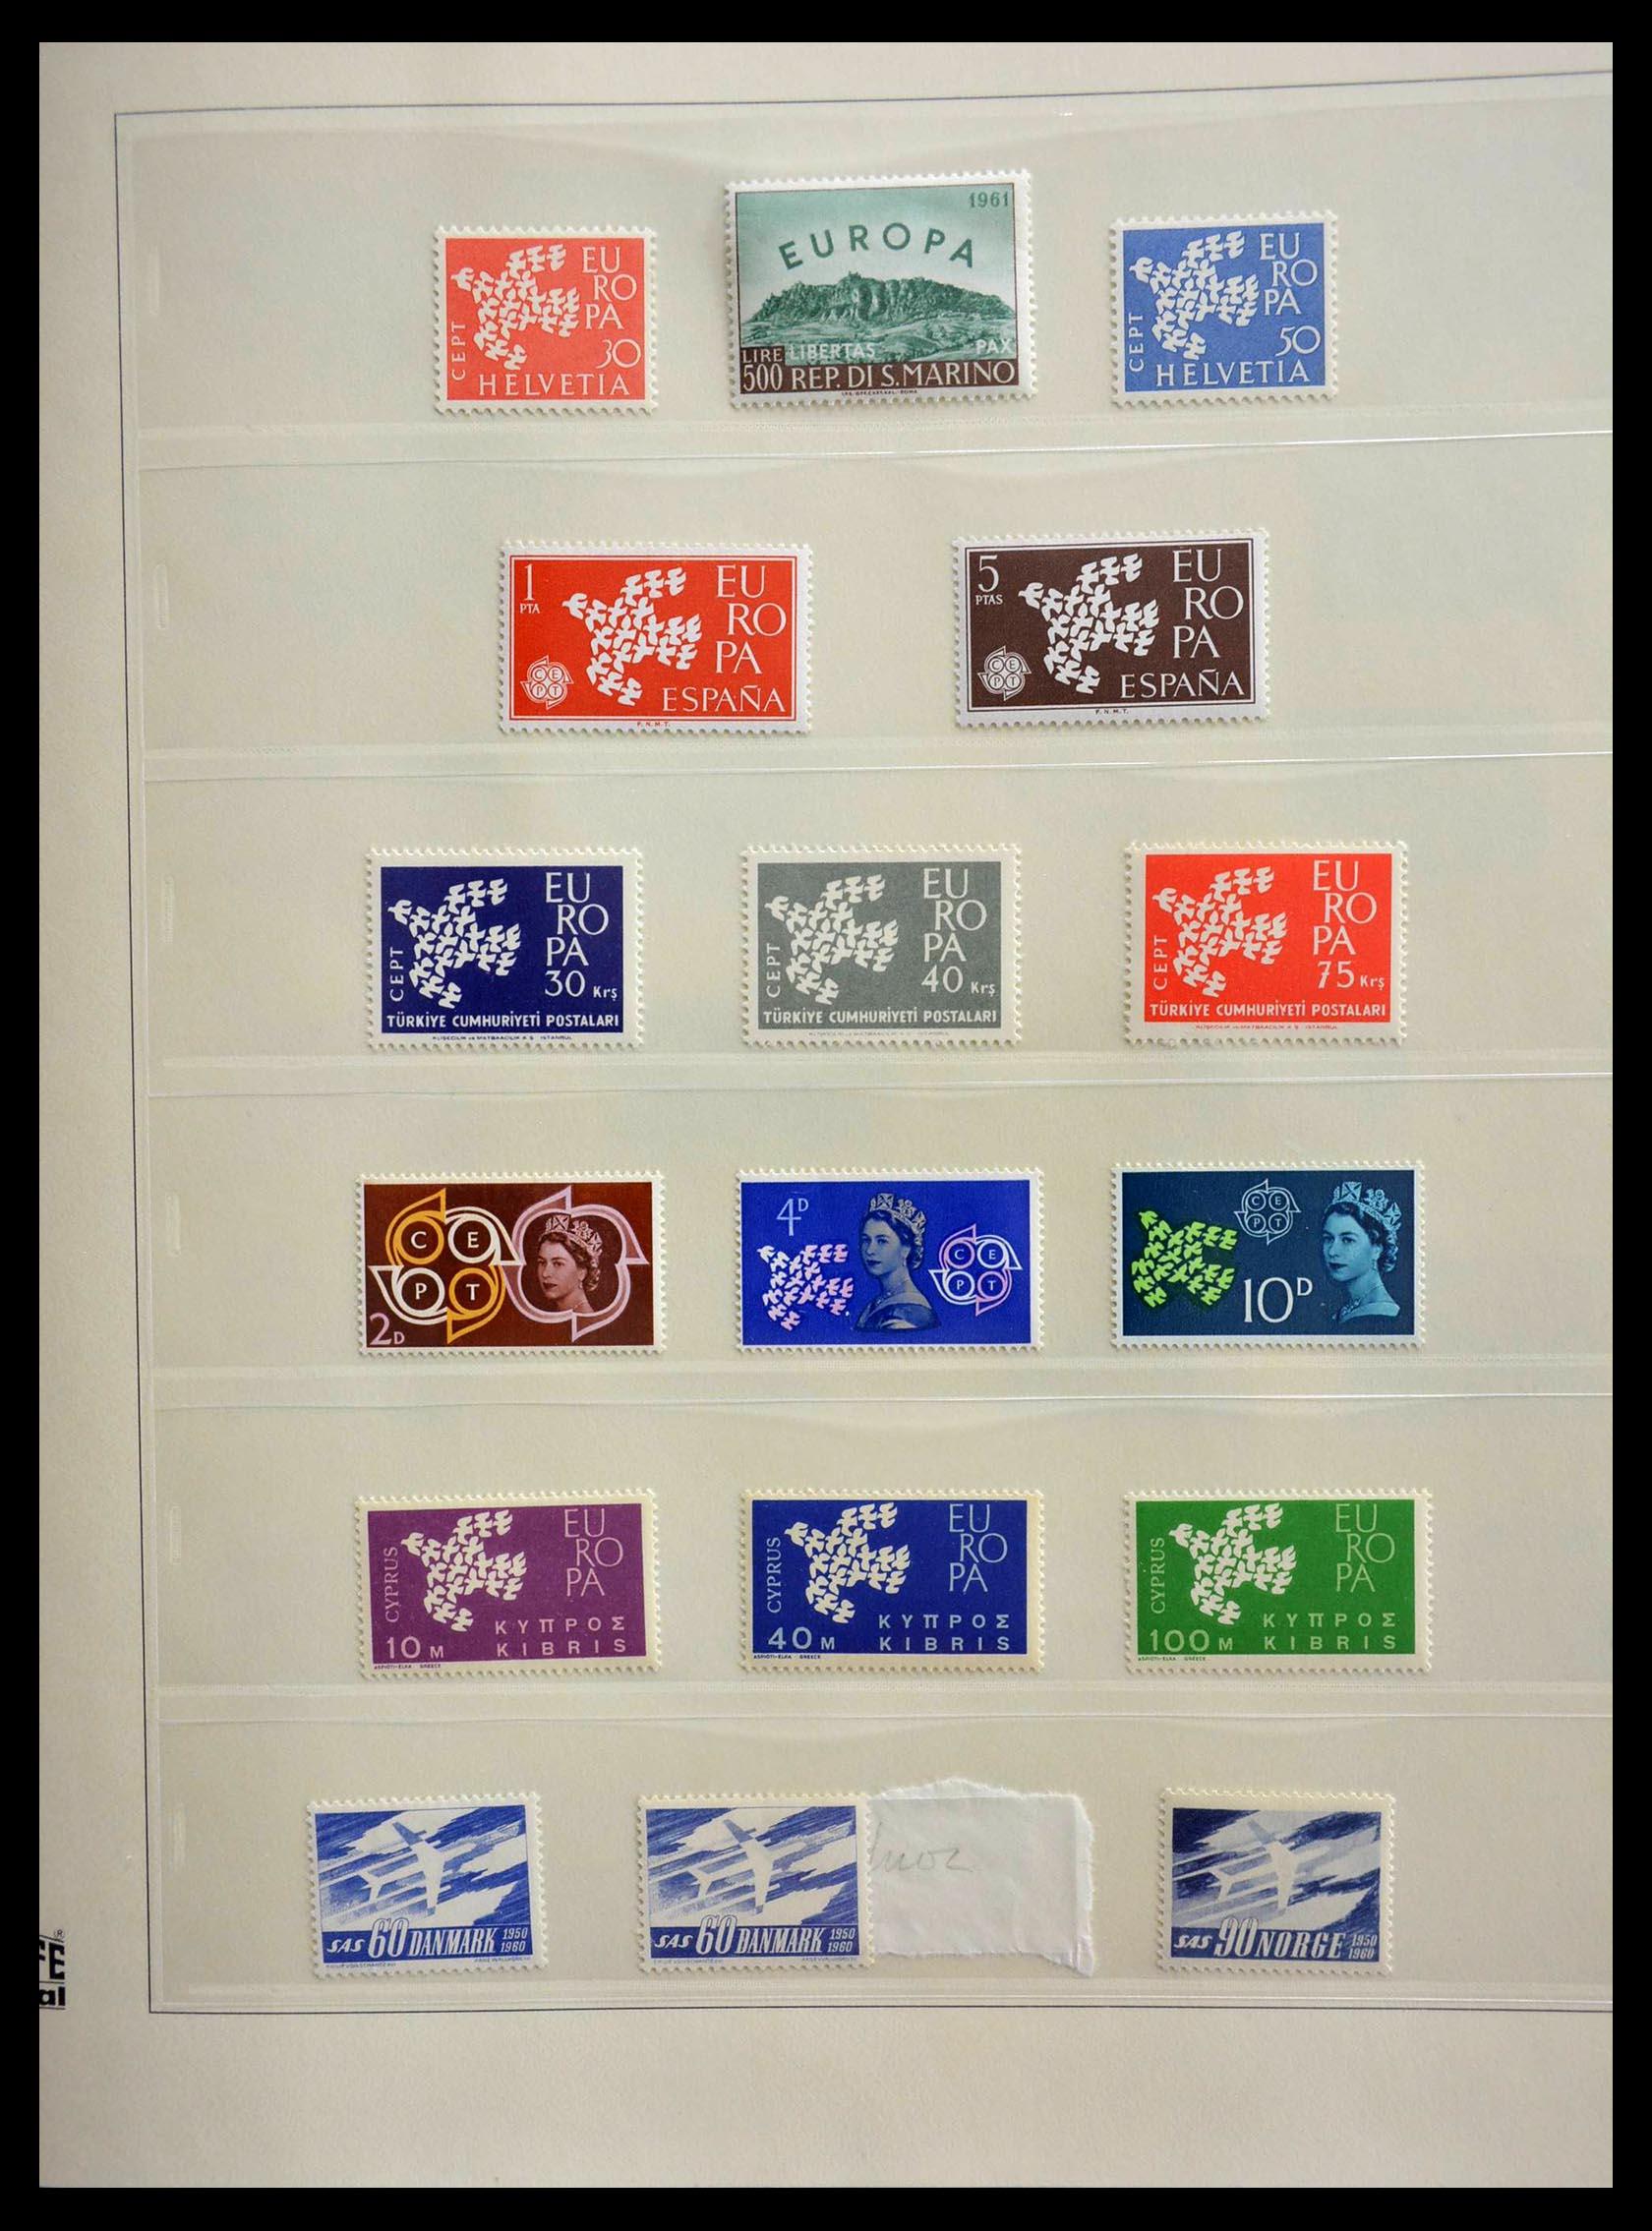 28637 008 - 28637 Europe Cept 1956-2000.